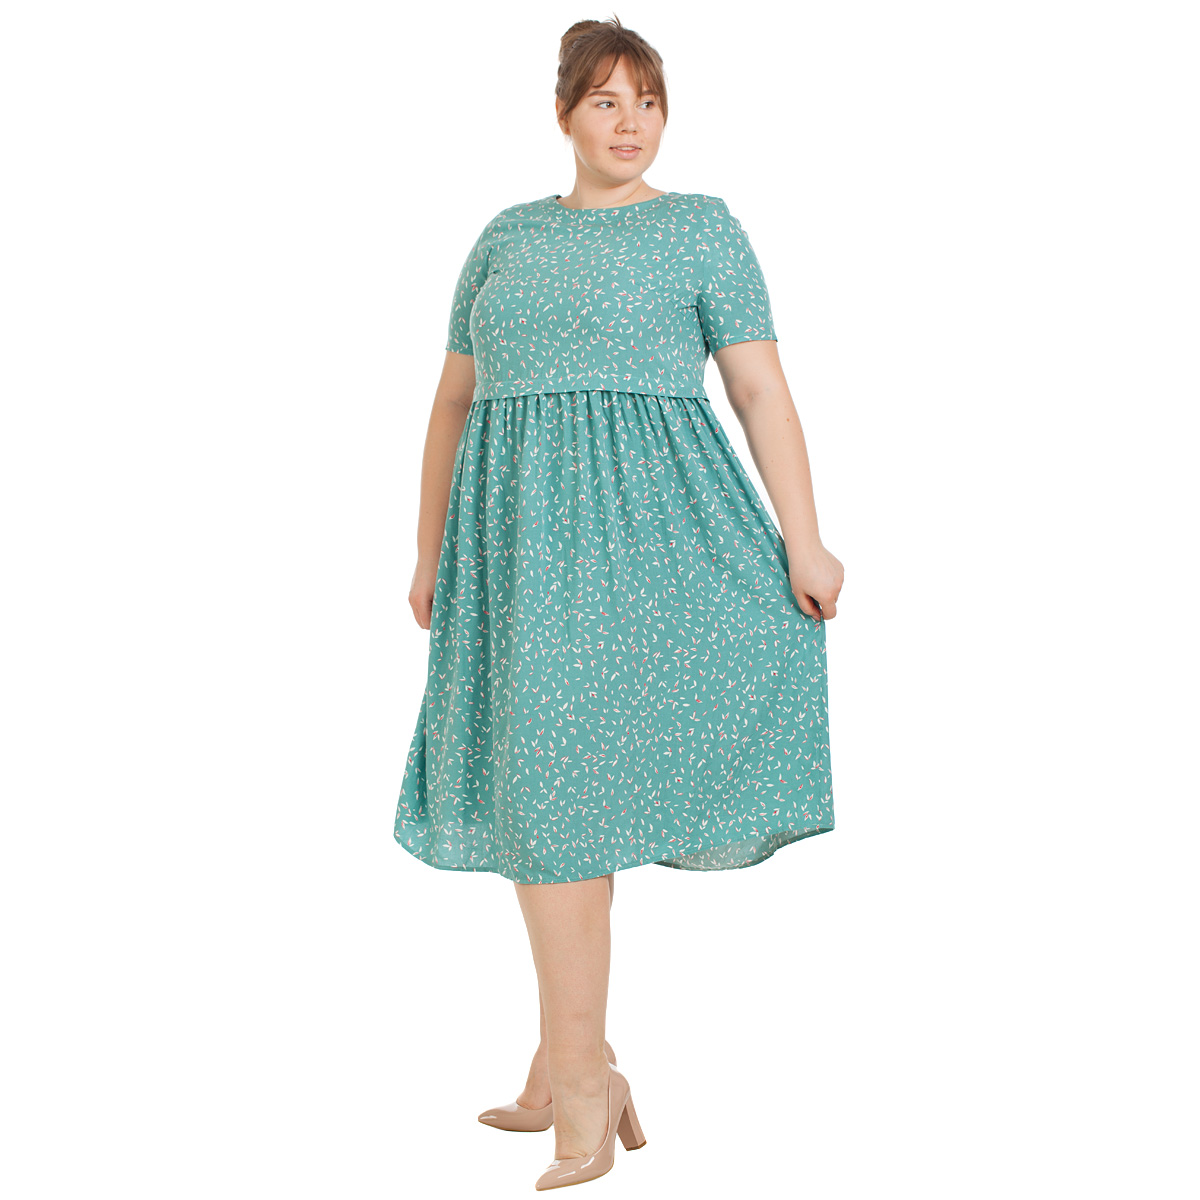 Платье Glavmod, JA17 платье oodji ultra цвет красный белый 14001071 13 46148 4512s размер xs 42 170